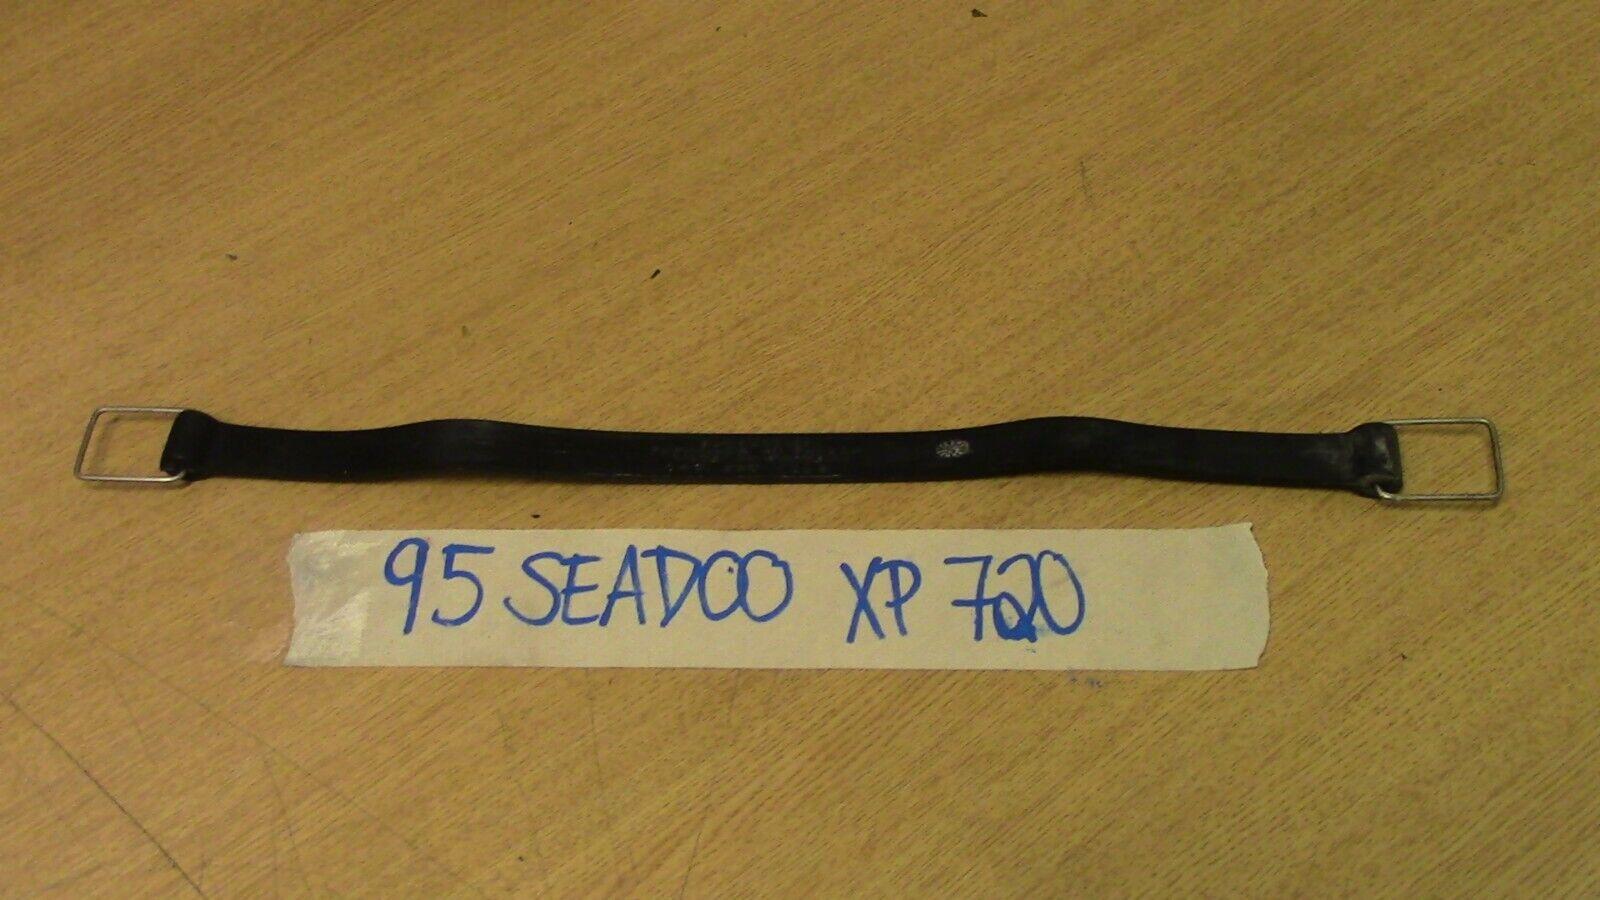 96-02 SEADOO EXPLORER SP SPI SPX XP FUEL GAS TANK STRAP 293850023 SOLD SEPARATE